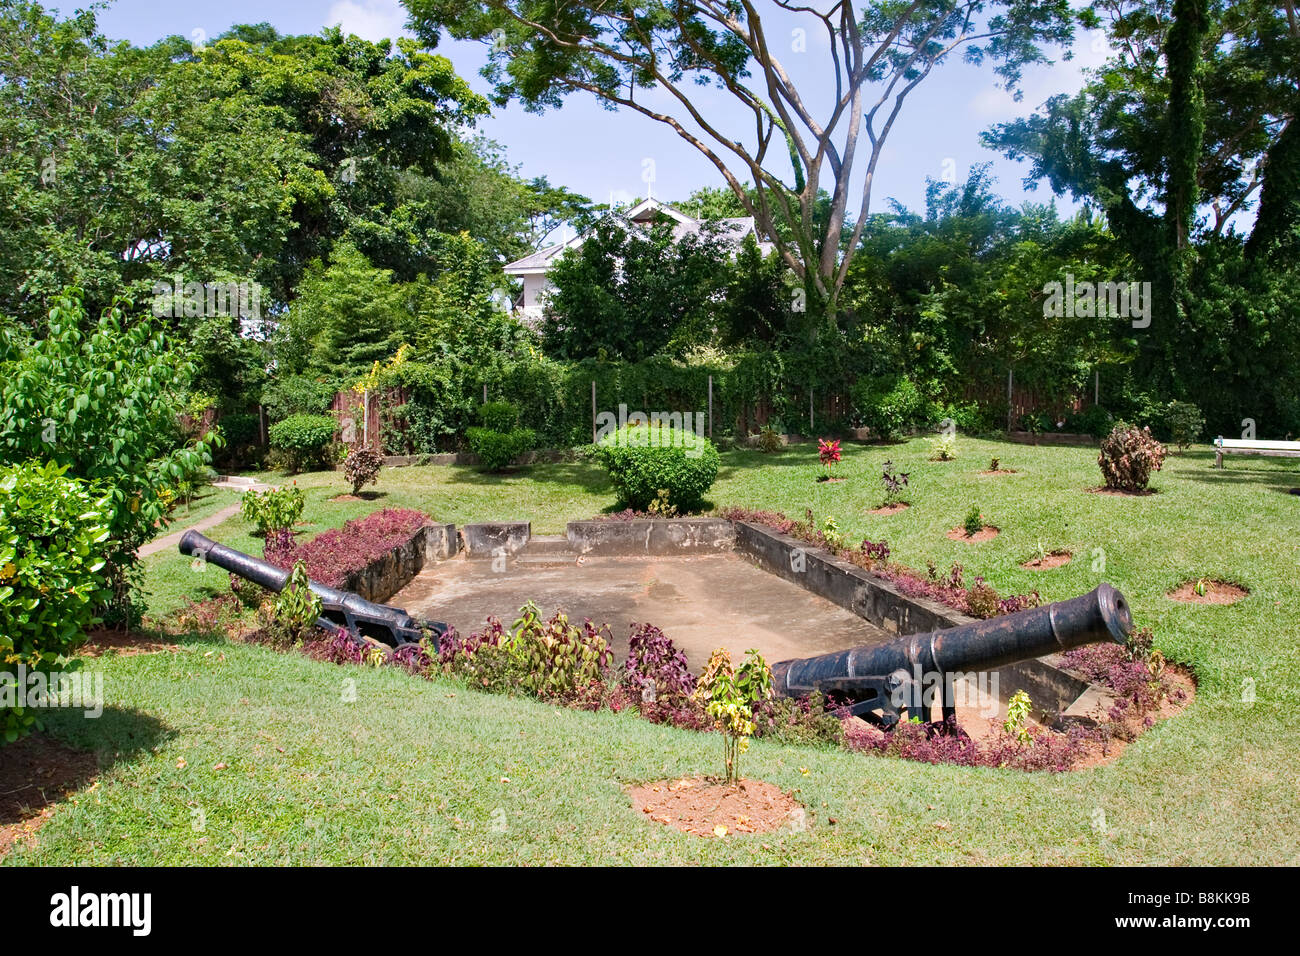 Fort Bennett, Tobago, Trinidad and Tobago, Caribbean Stock Photo